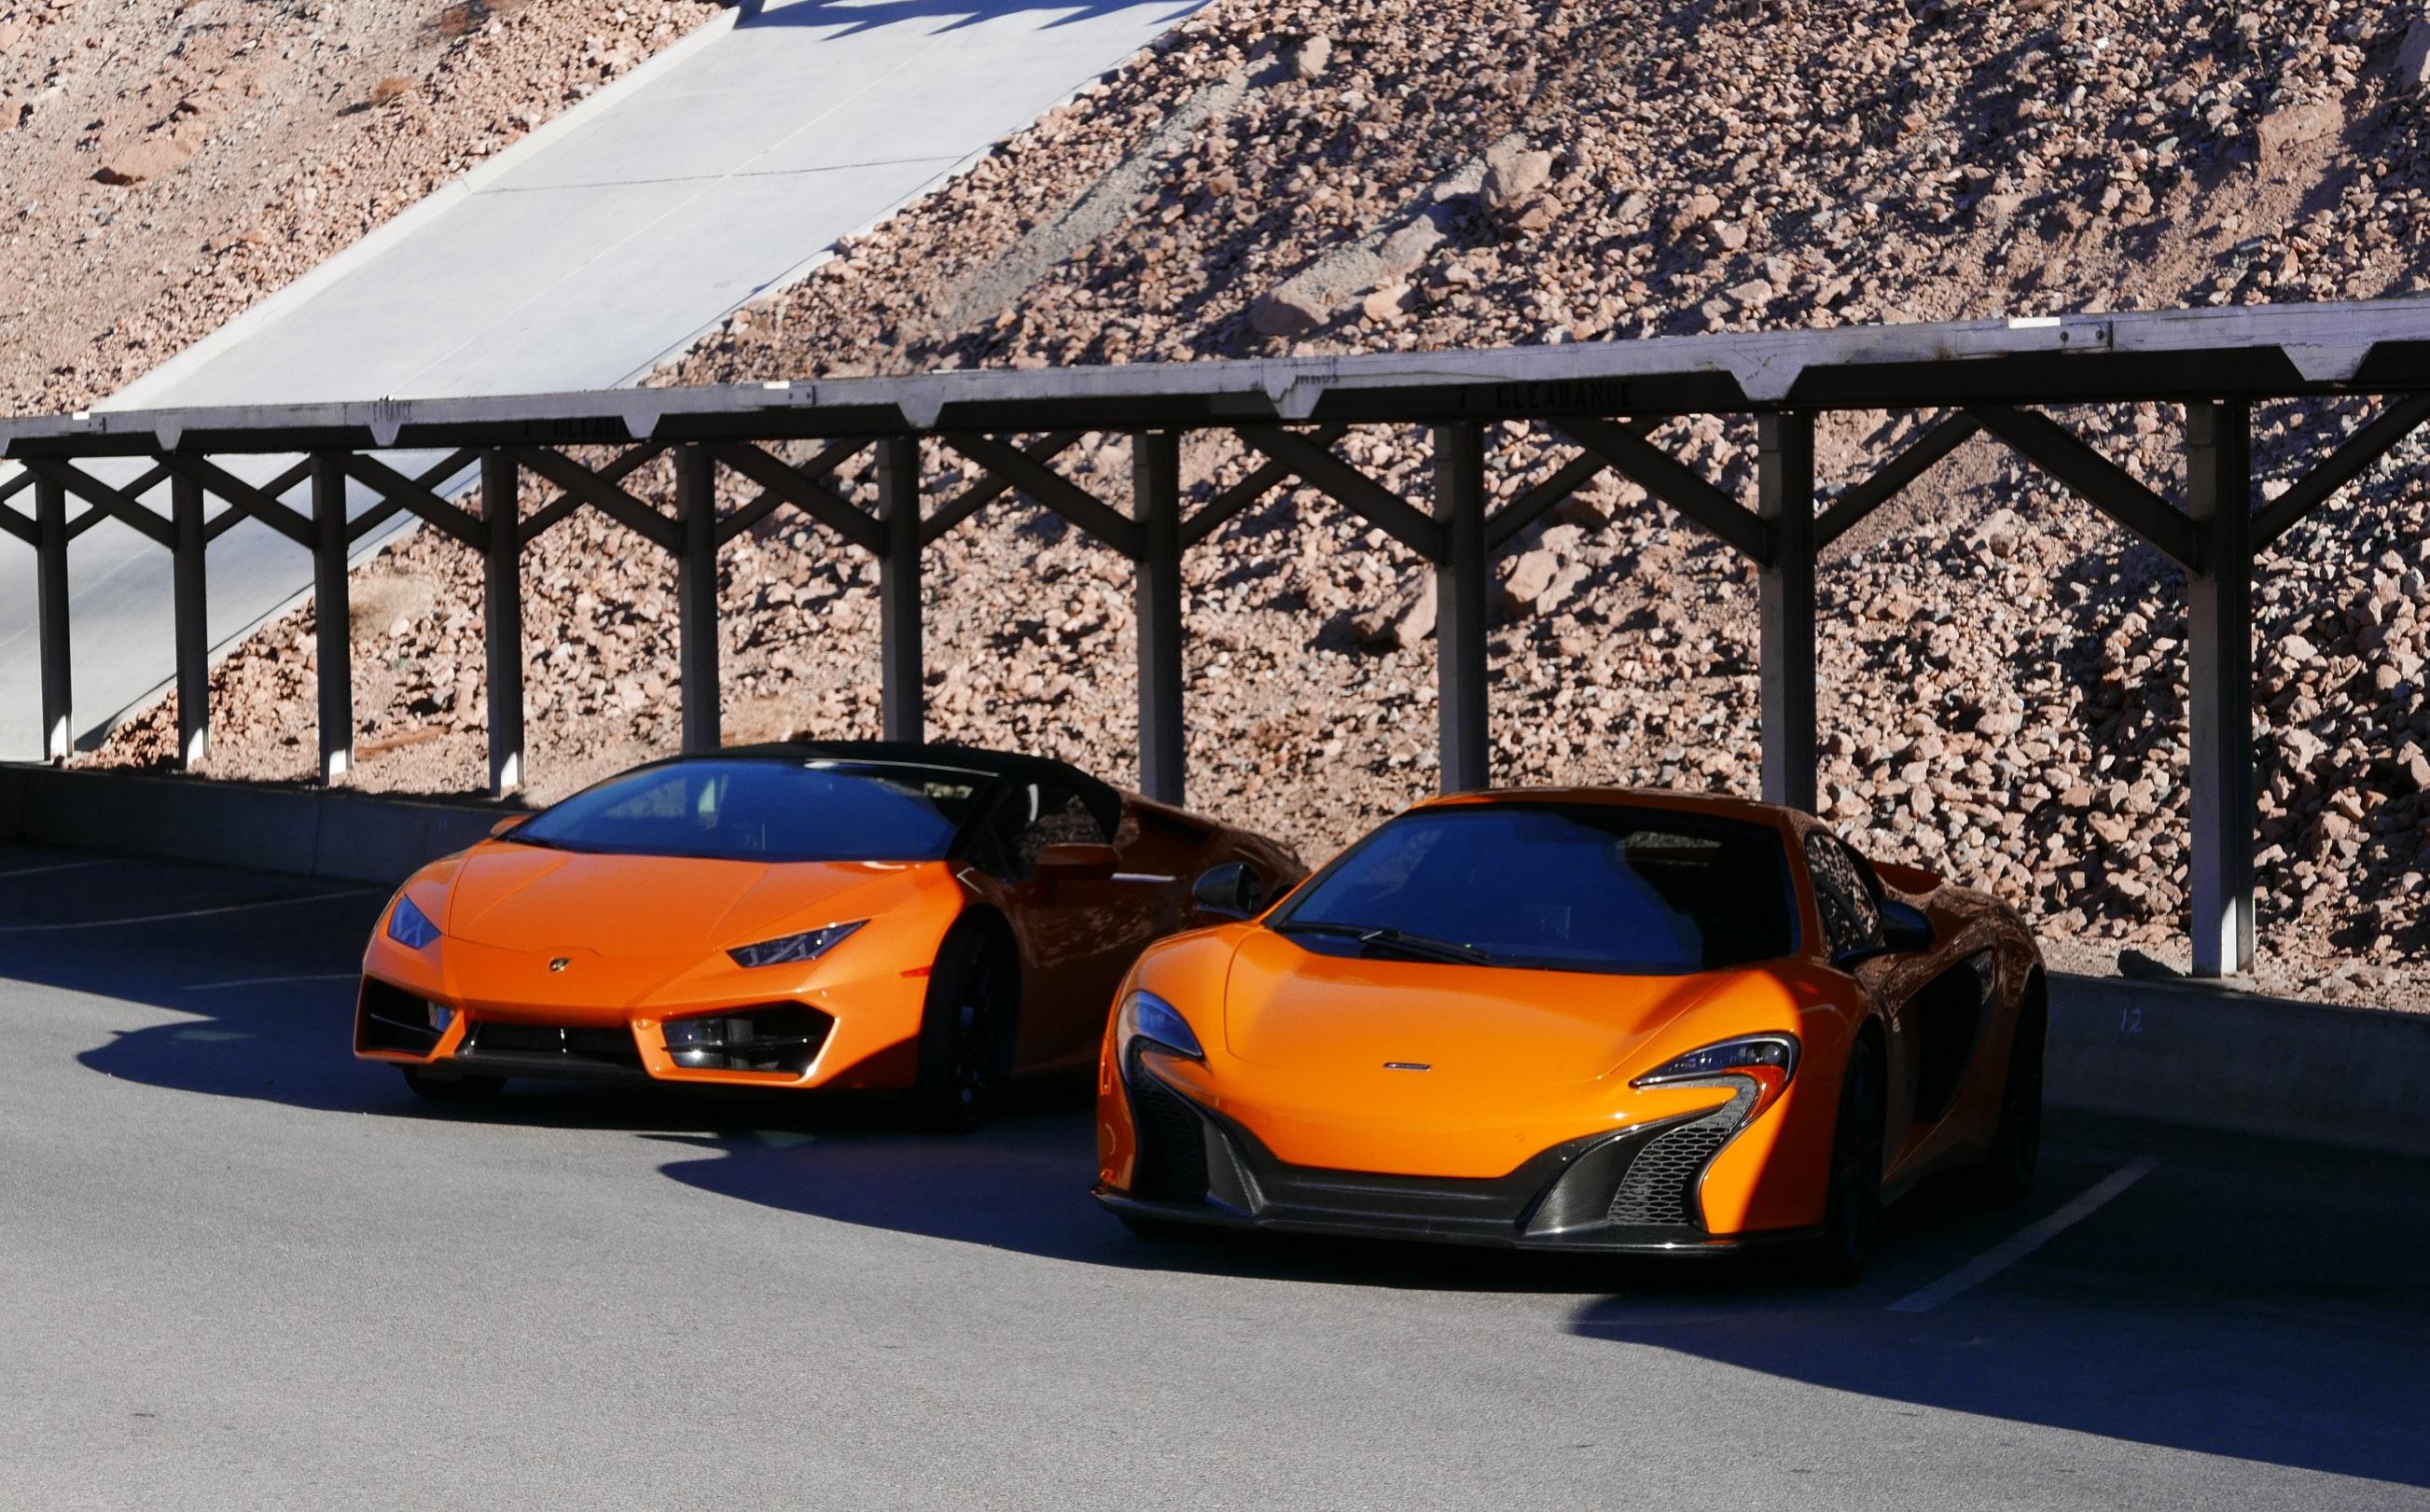 Photography of Two Orange Sports Car, Asphalt, Luxury, Wheels, Vehicles, HQ Photo